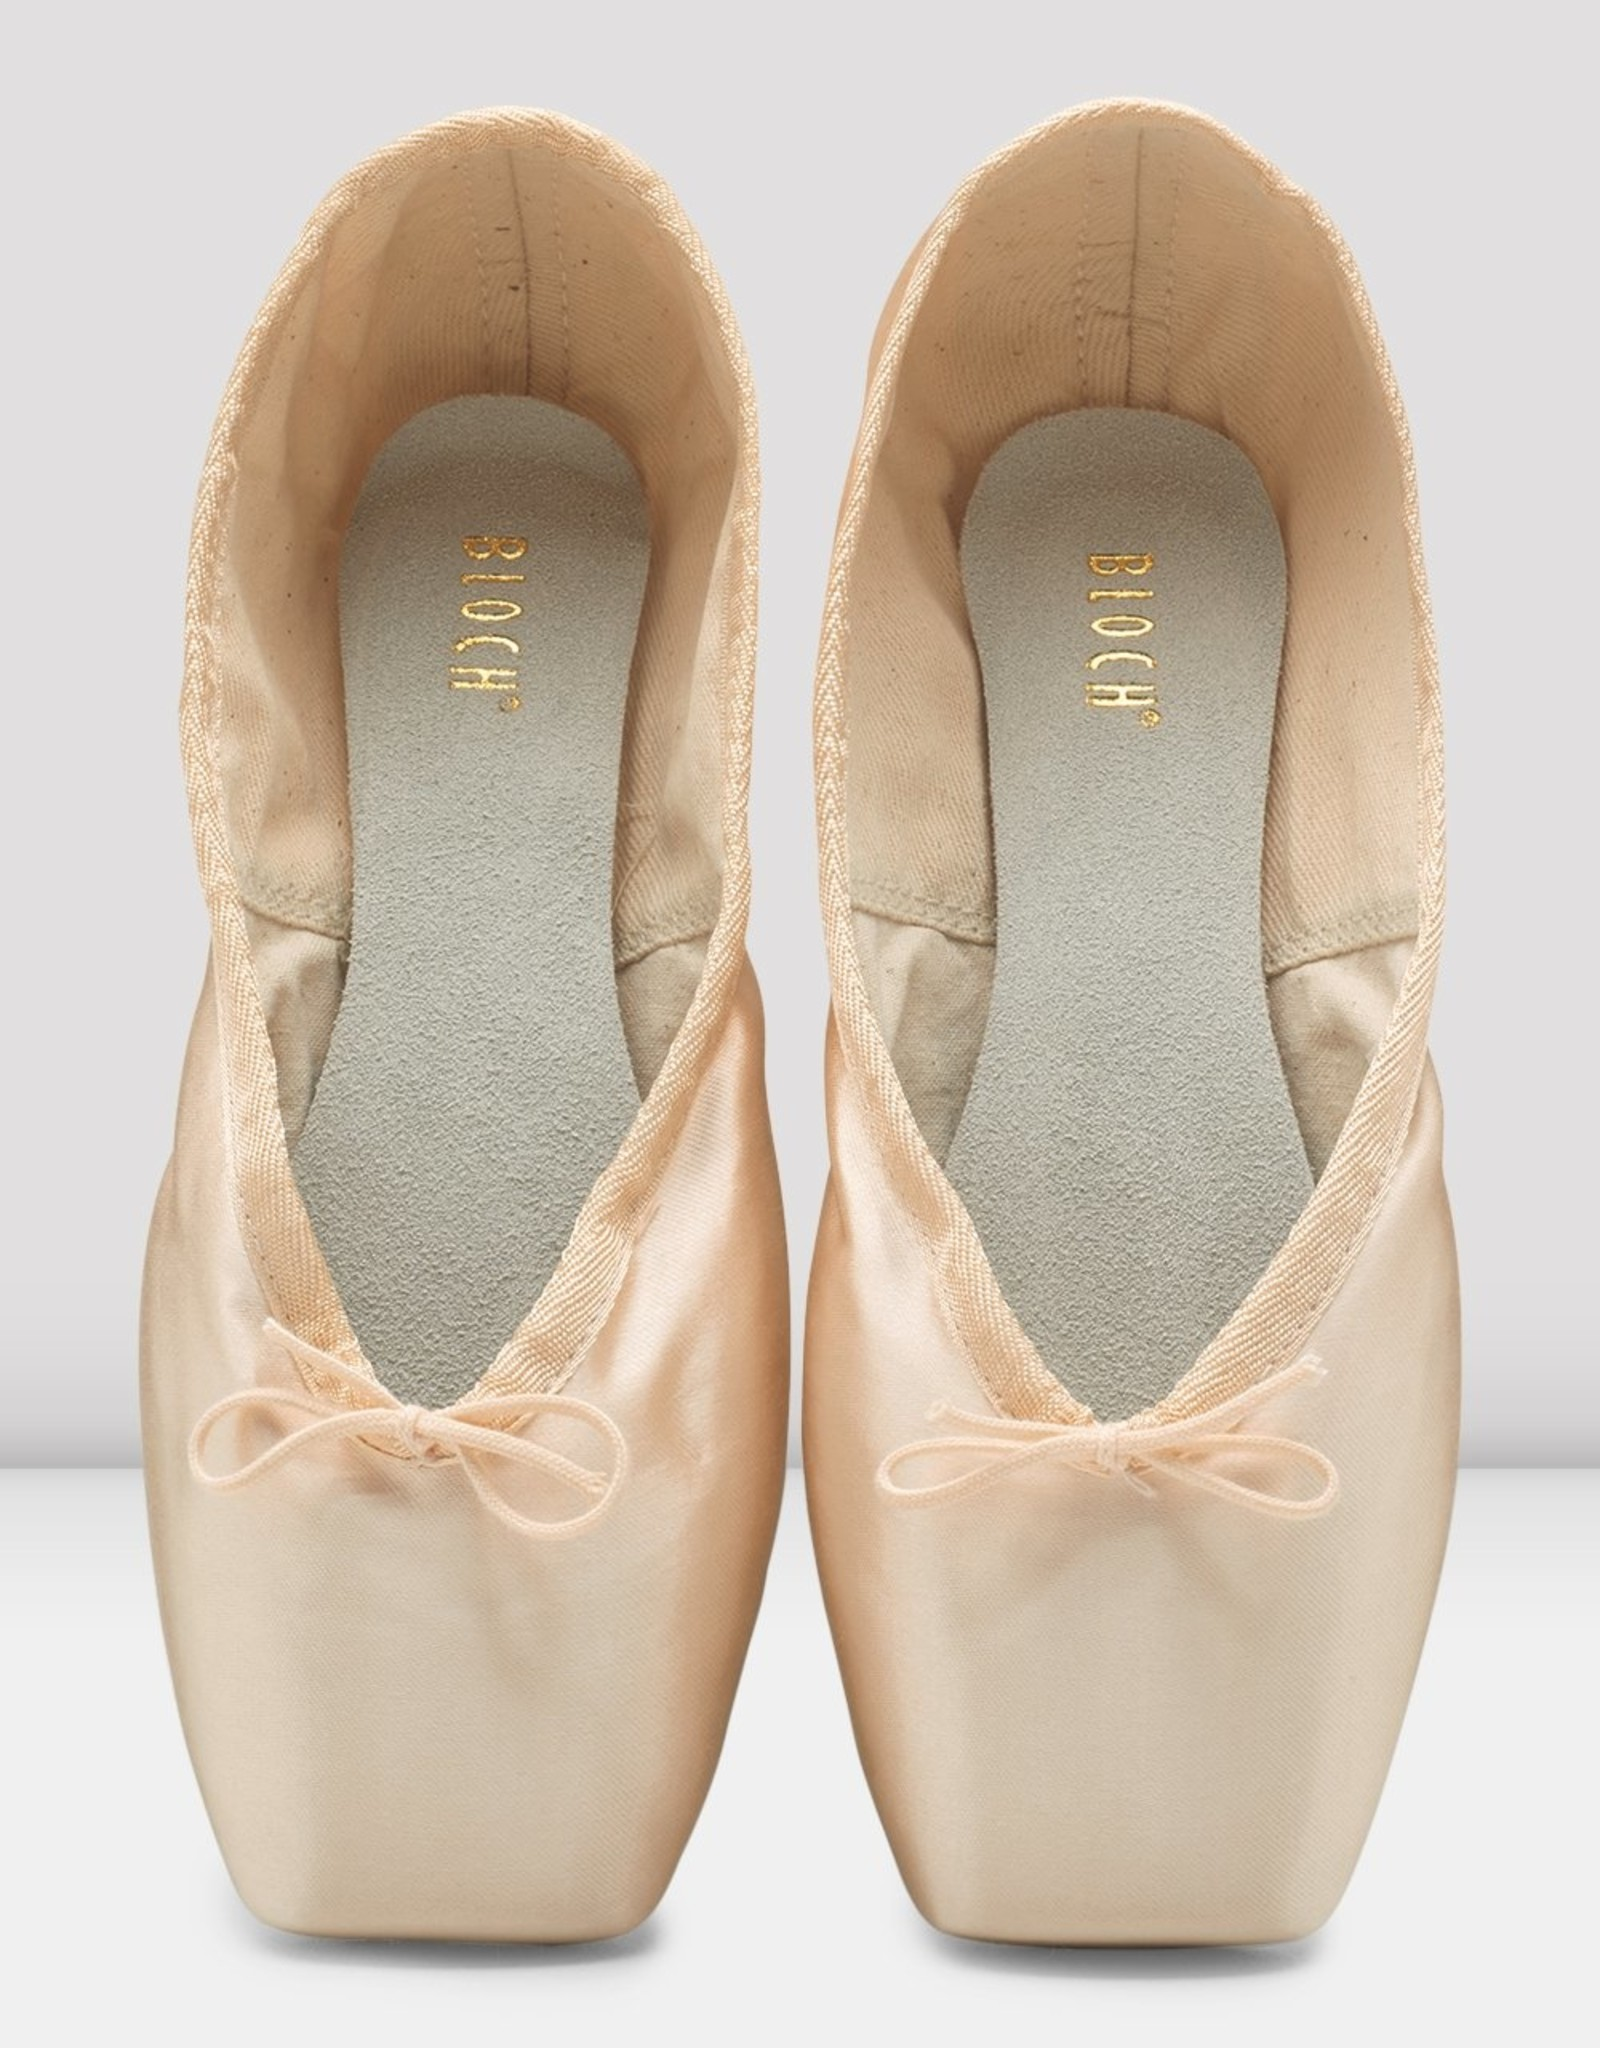 Bloch Bloch Heritage Pointe Shoe S0180L